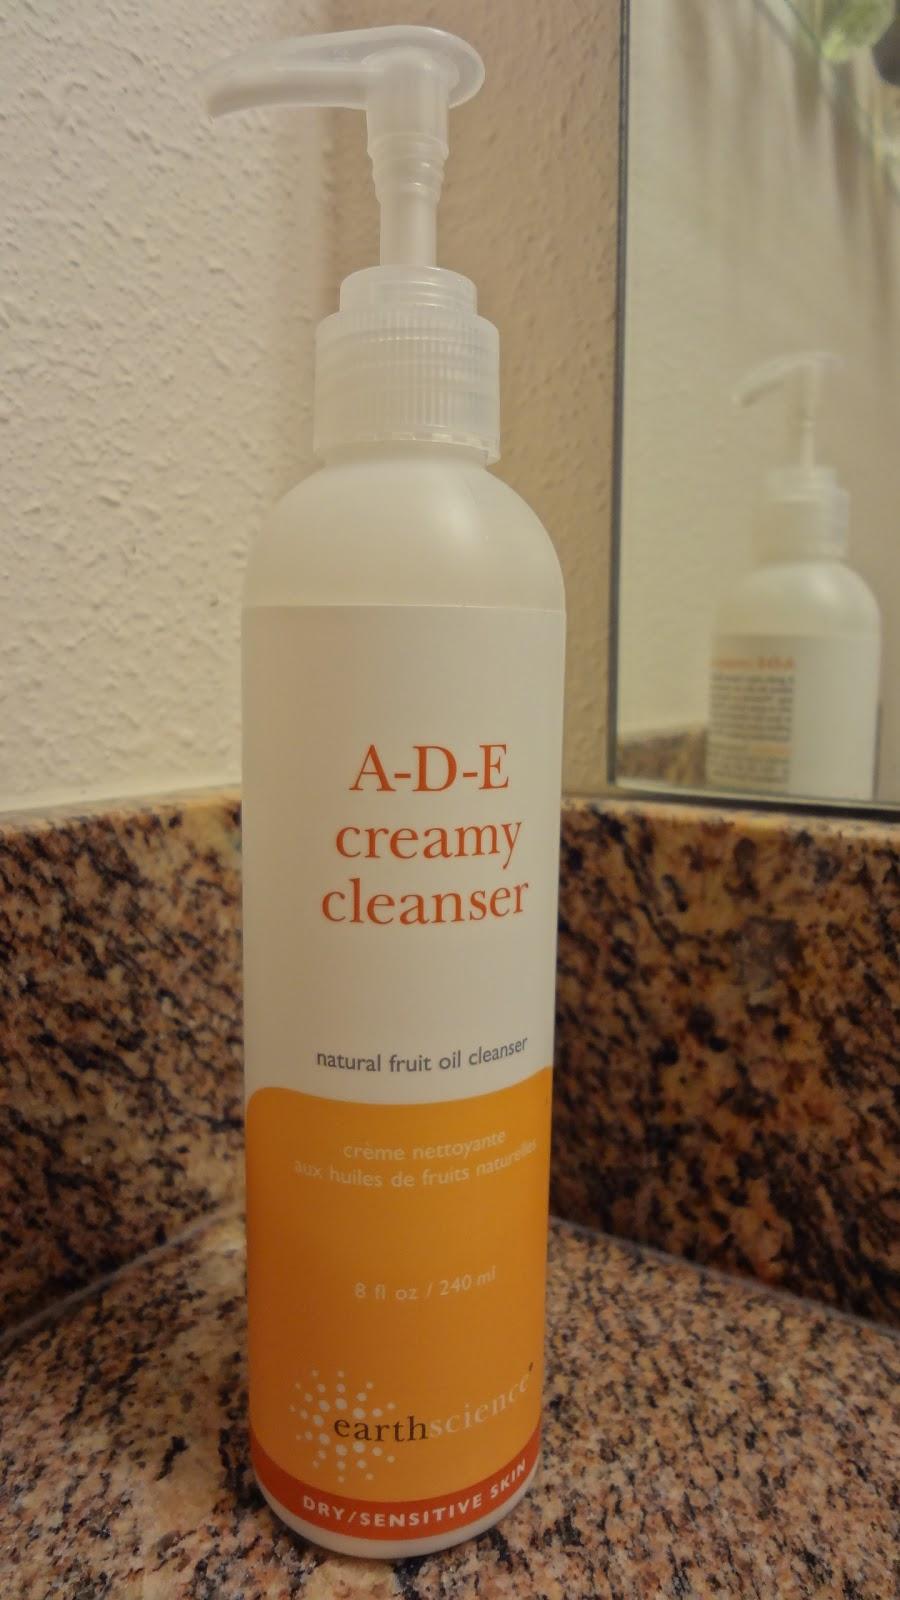 Creamy Fruit Oil Cleanser (A-D-E) Earth Science 8 oz Lotion Mizon, Collagen 100, 1 oz(pack of 1)